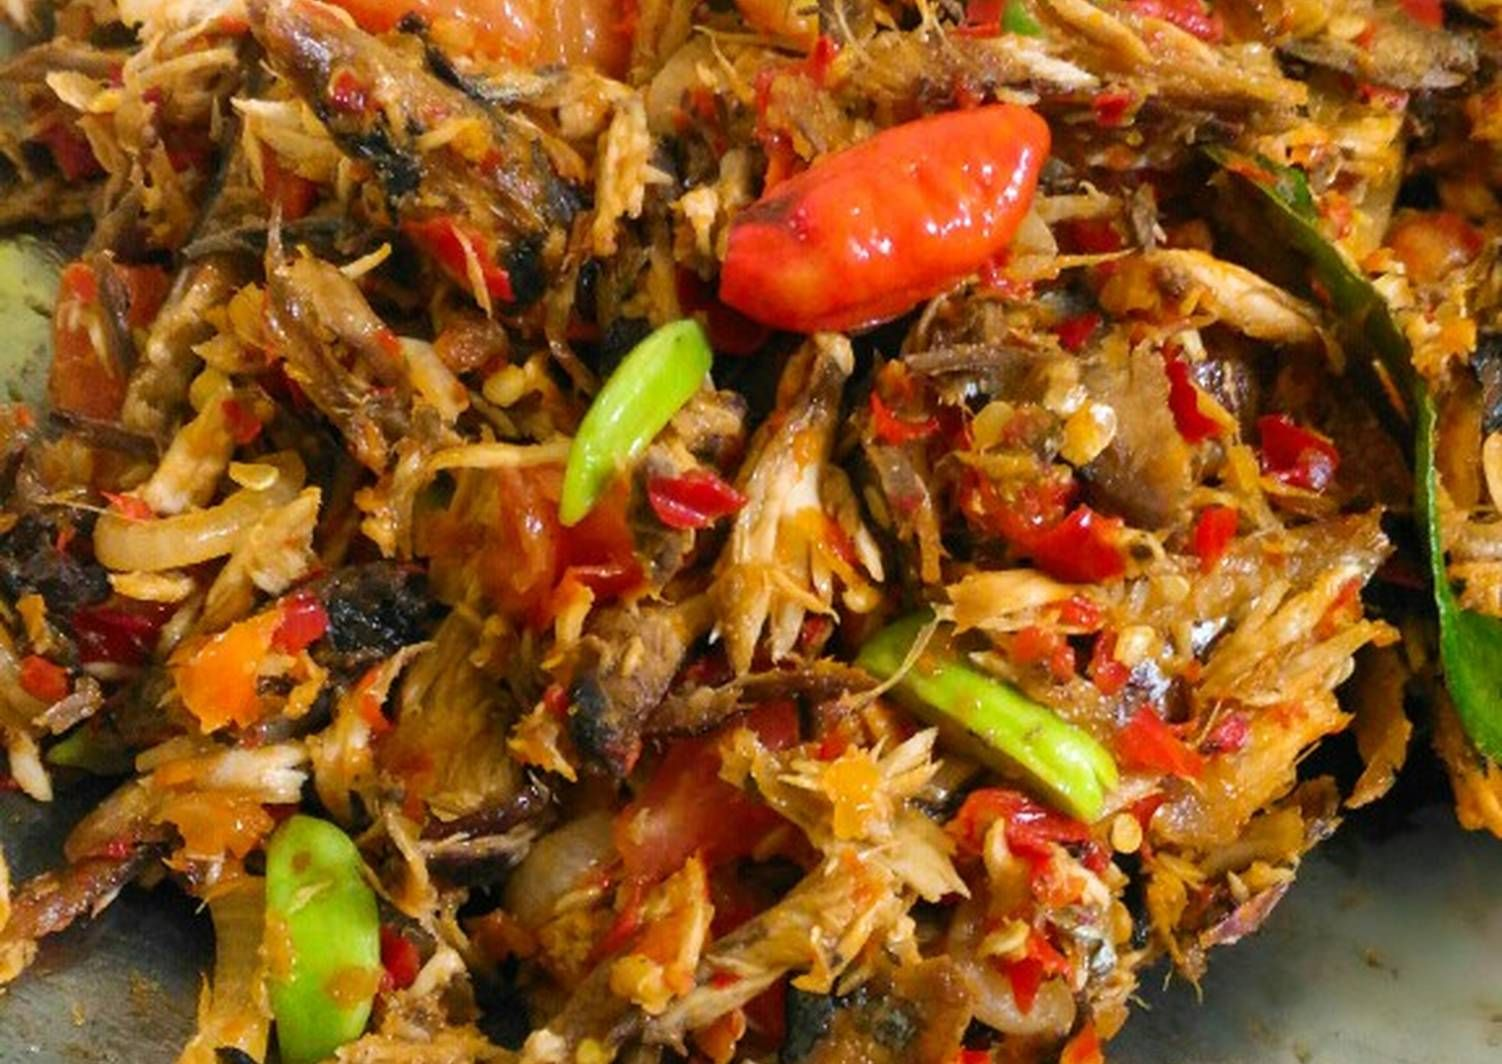 Resep Tongkol Suwir Simple Oleh Whawha Stroberry Hitam Resep Resep Masakan Resep Resep Makanan